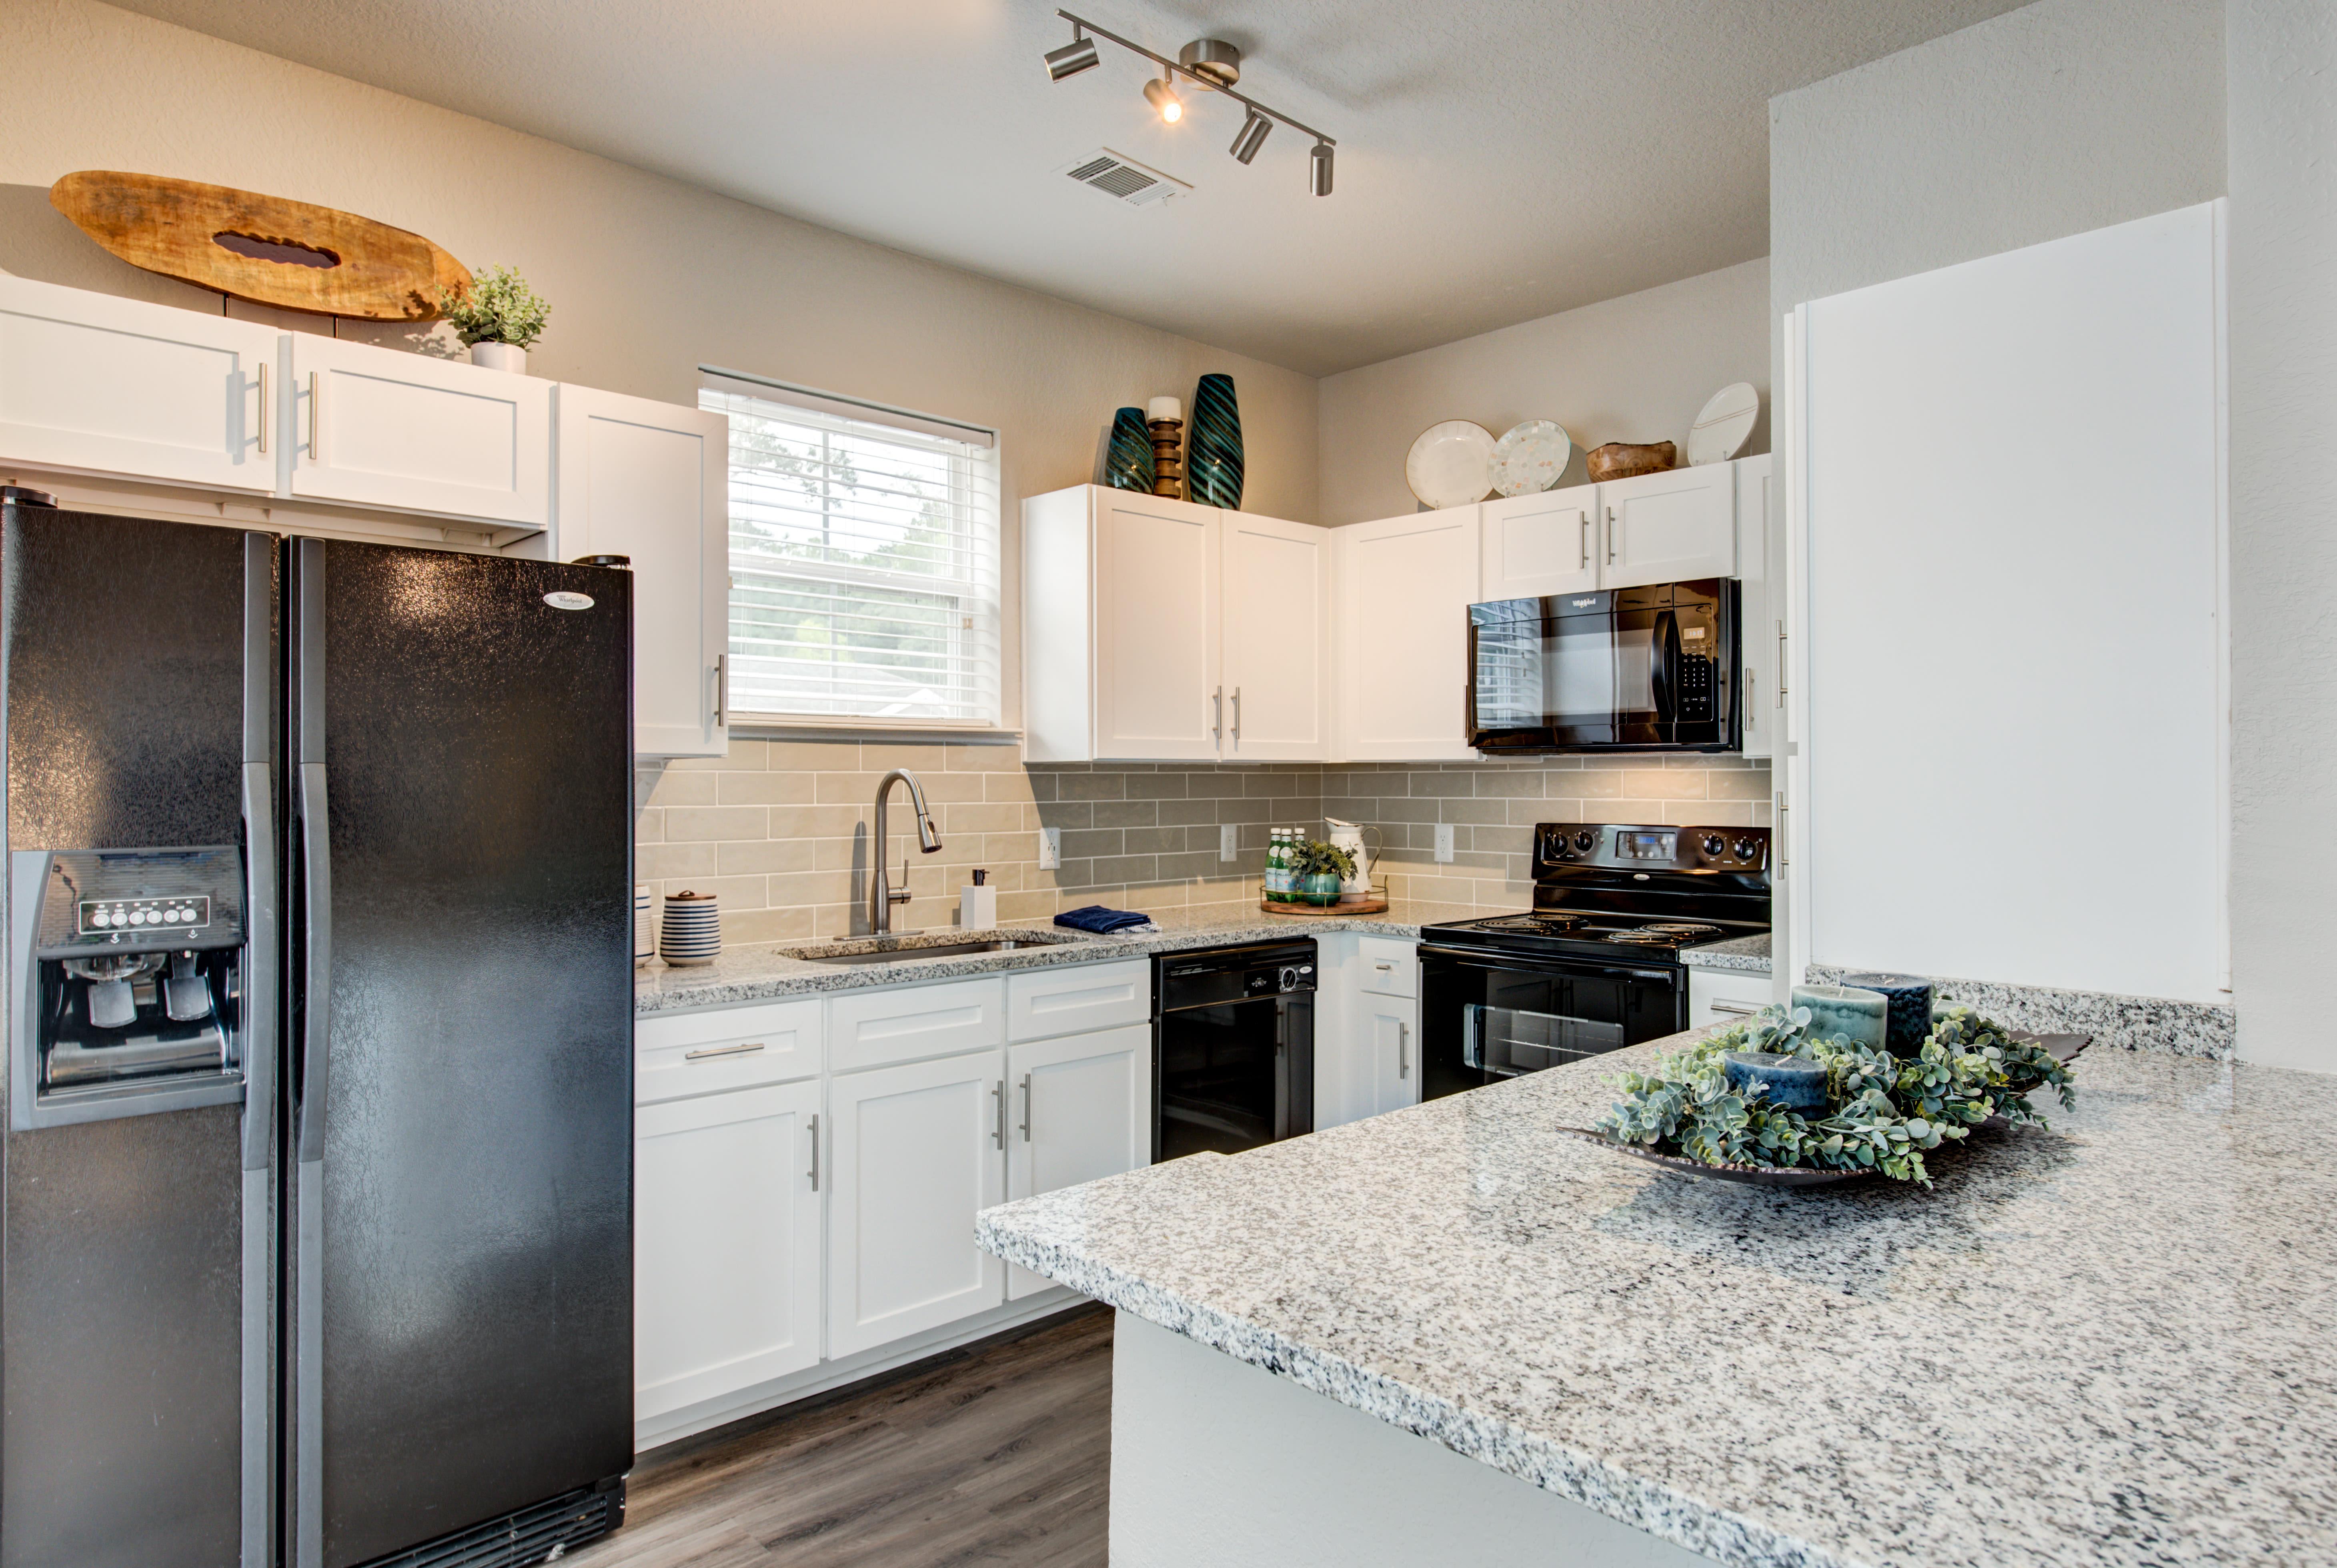 Model kitchen at Ingleside Apartments in North Charleston, South Carolina